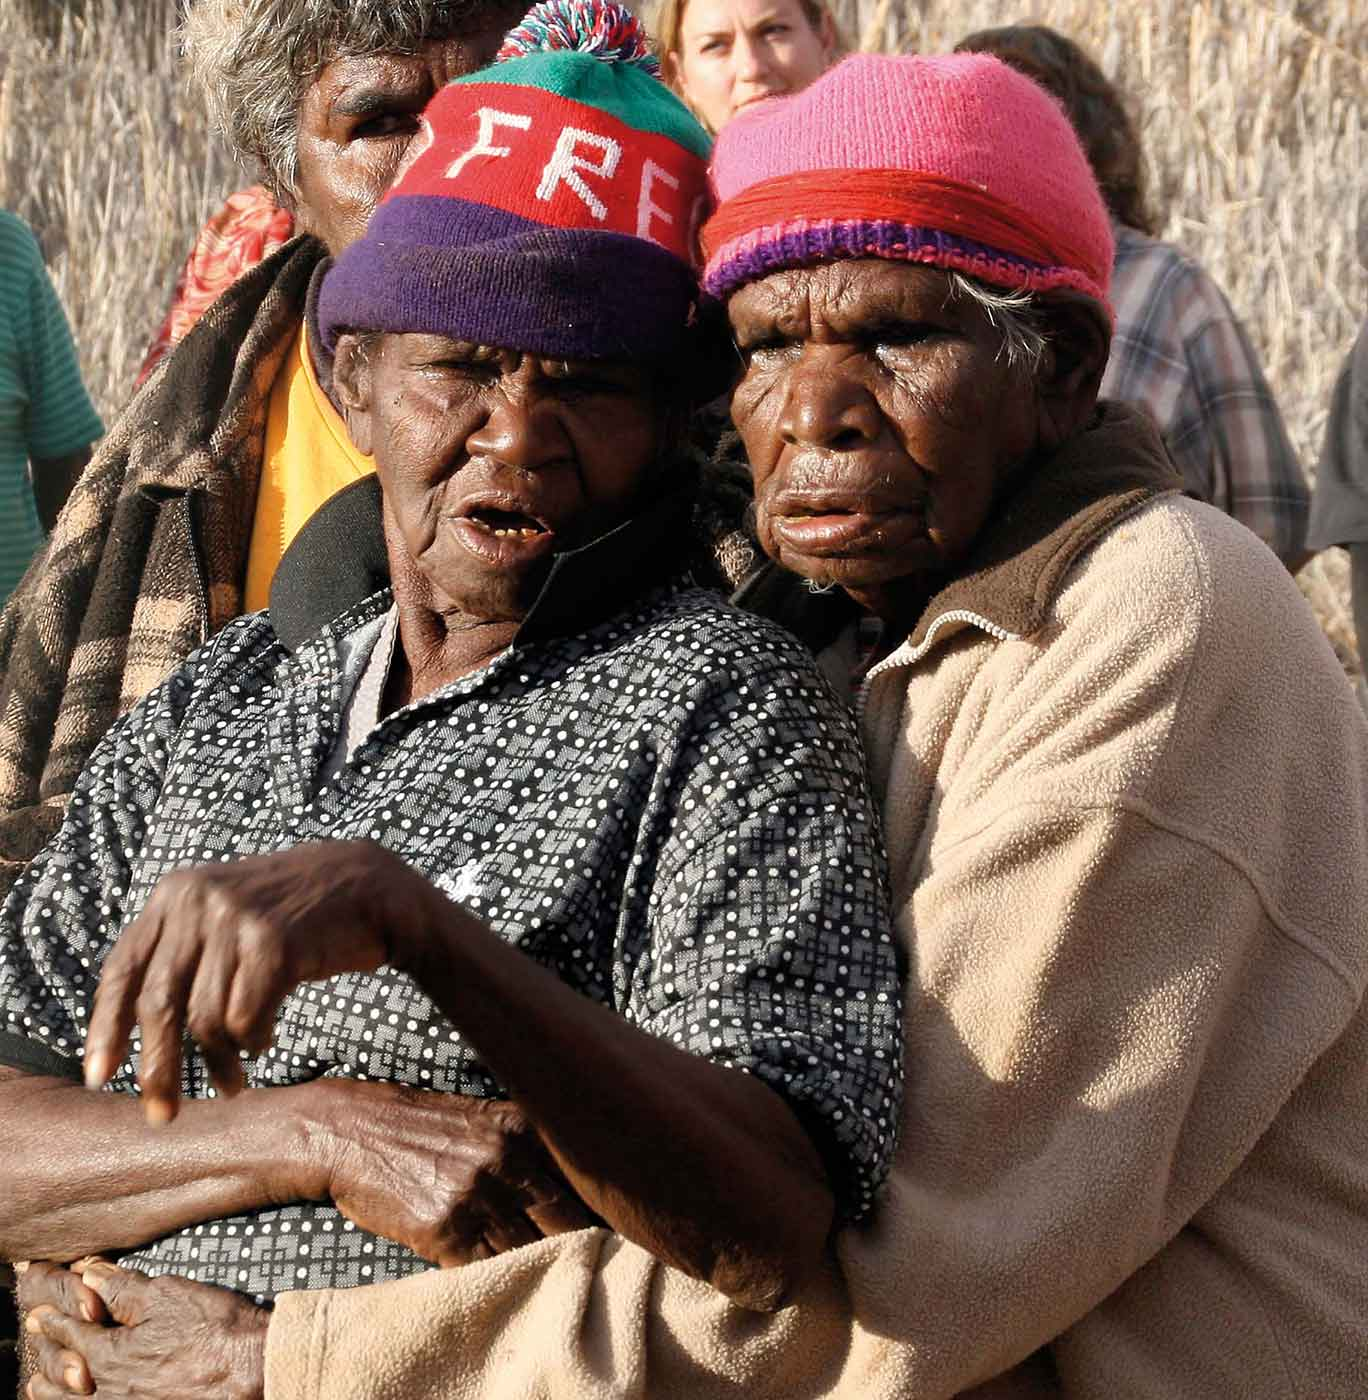 Two elderly women embracing.